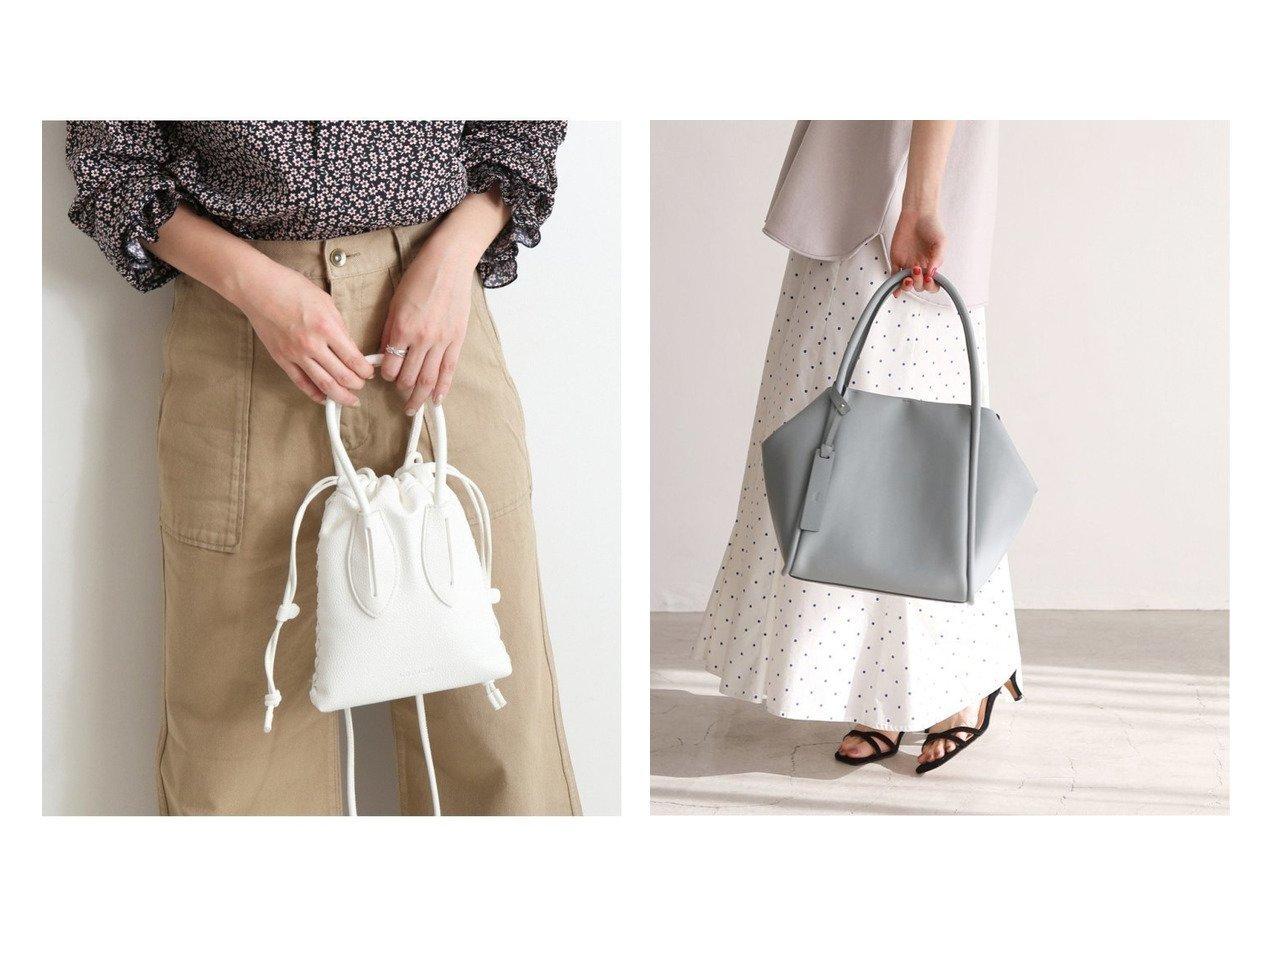 【SLOBE IENA/スローブ イエナ】の【トーヴ】PIP HANDトートバッグ&ADD CULUMNTURN Sショルダーバッグ バッグ・鞄のおすすめ!人気、トレンド・レディースファッションの通販 おすすめで人気の流行・トレンド、ファッションの通販商品 メンズファッション・キッズファッション・インテリア・家具・レディースファッション・服の通販 founy(ファニー) https://founy.com/ ファッション Fashion レディースファッション WOMEN バッグ Bag 2021年 2021 2021 春夏 S/S SS Spring/Summer 2021 S/S 春夏 SS Spring/Summer フォルム 再入荷 Restock/Back in Stock/Re Arrival 軽量 NEW・新作・新着・新入荷 New Arrivals |ID:crp329100000023942